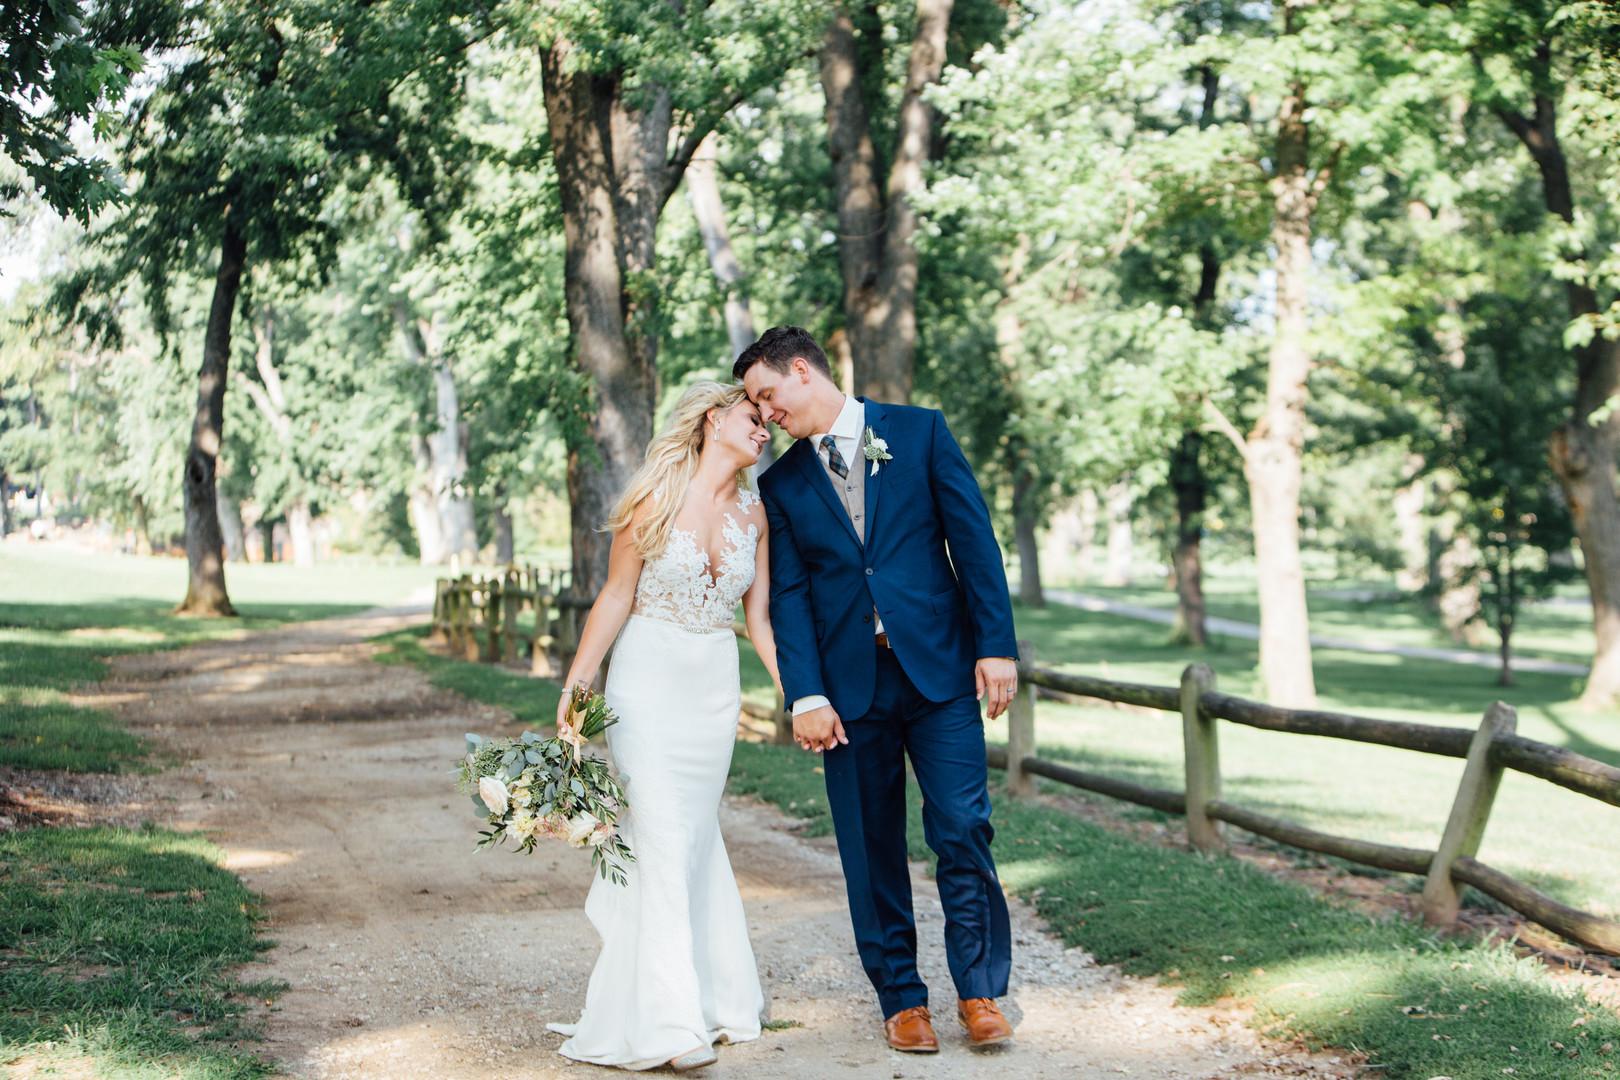 Blissful Outdoor Wedding at the University of Nebraska: Angela & Troy